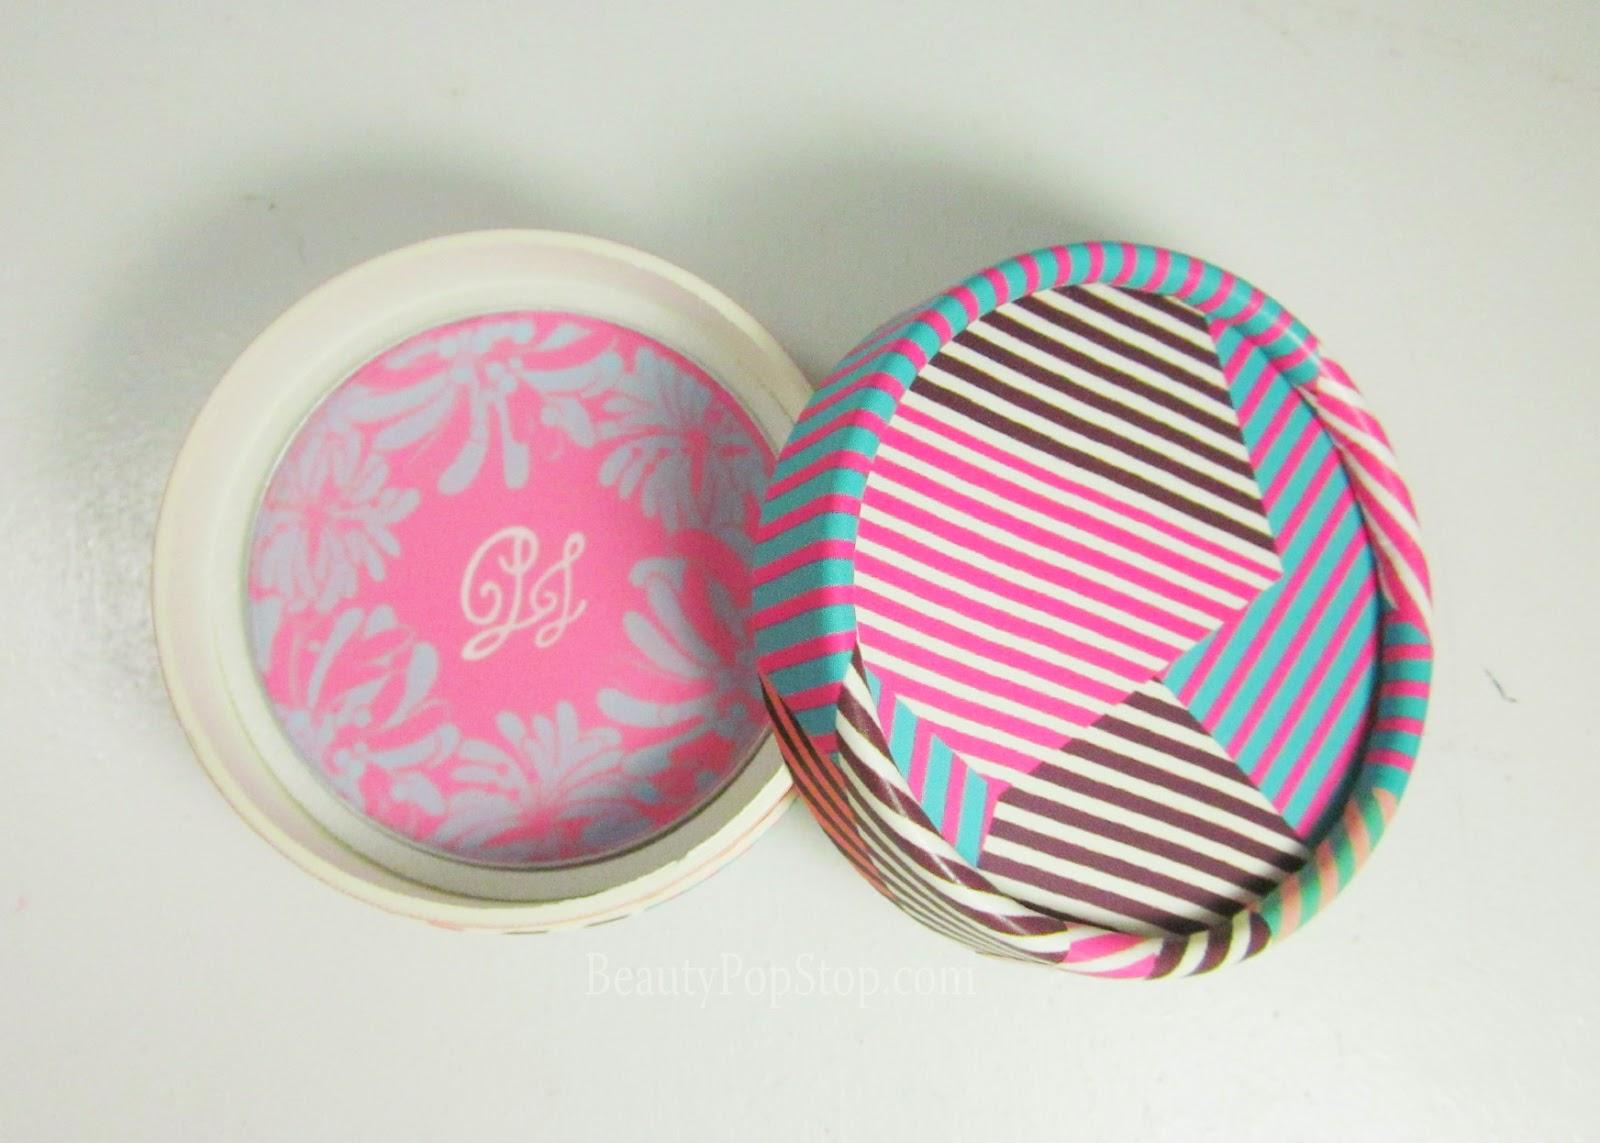 paul and joe beaute spring 2014 color powder azalea blush review